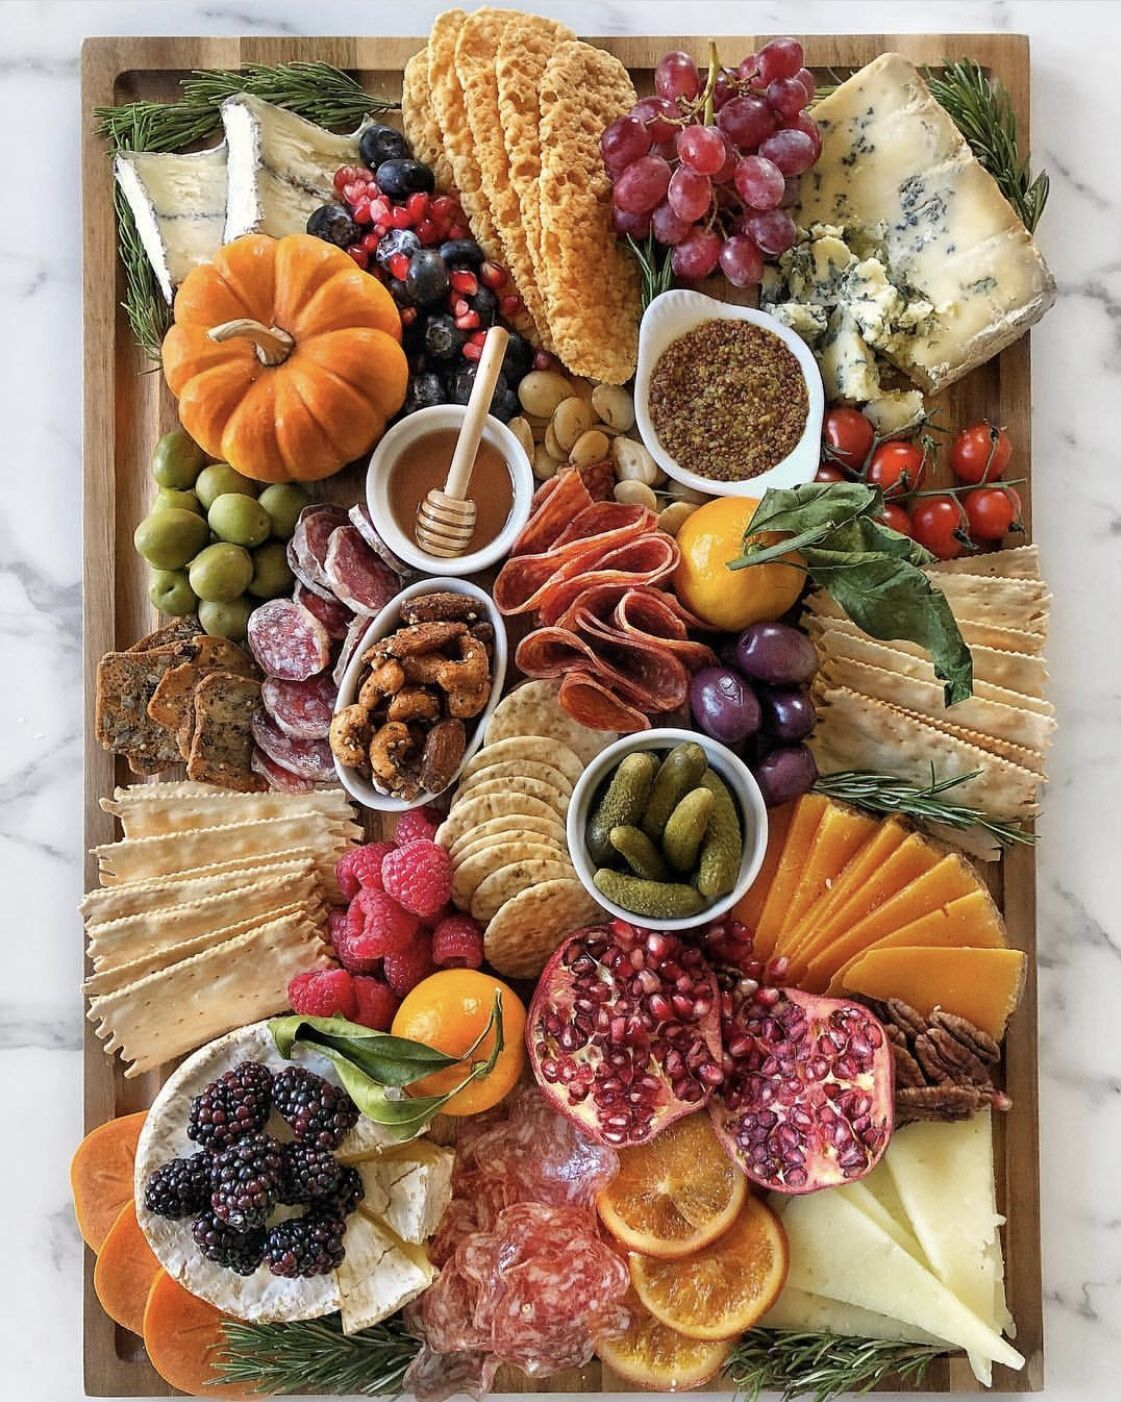 Autumn Cheese Board recipe by Meg Quinn | The Feedfeed